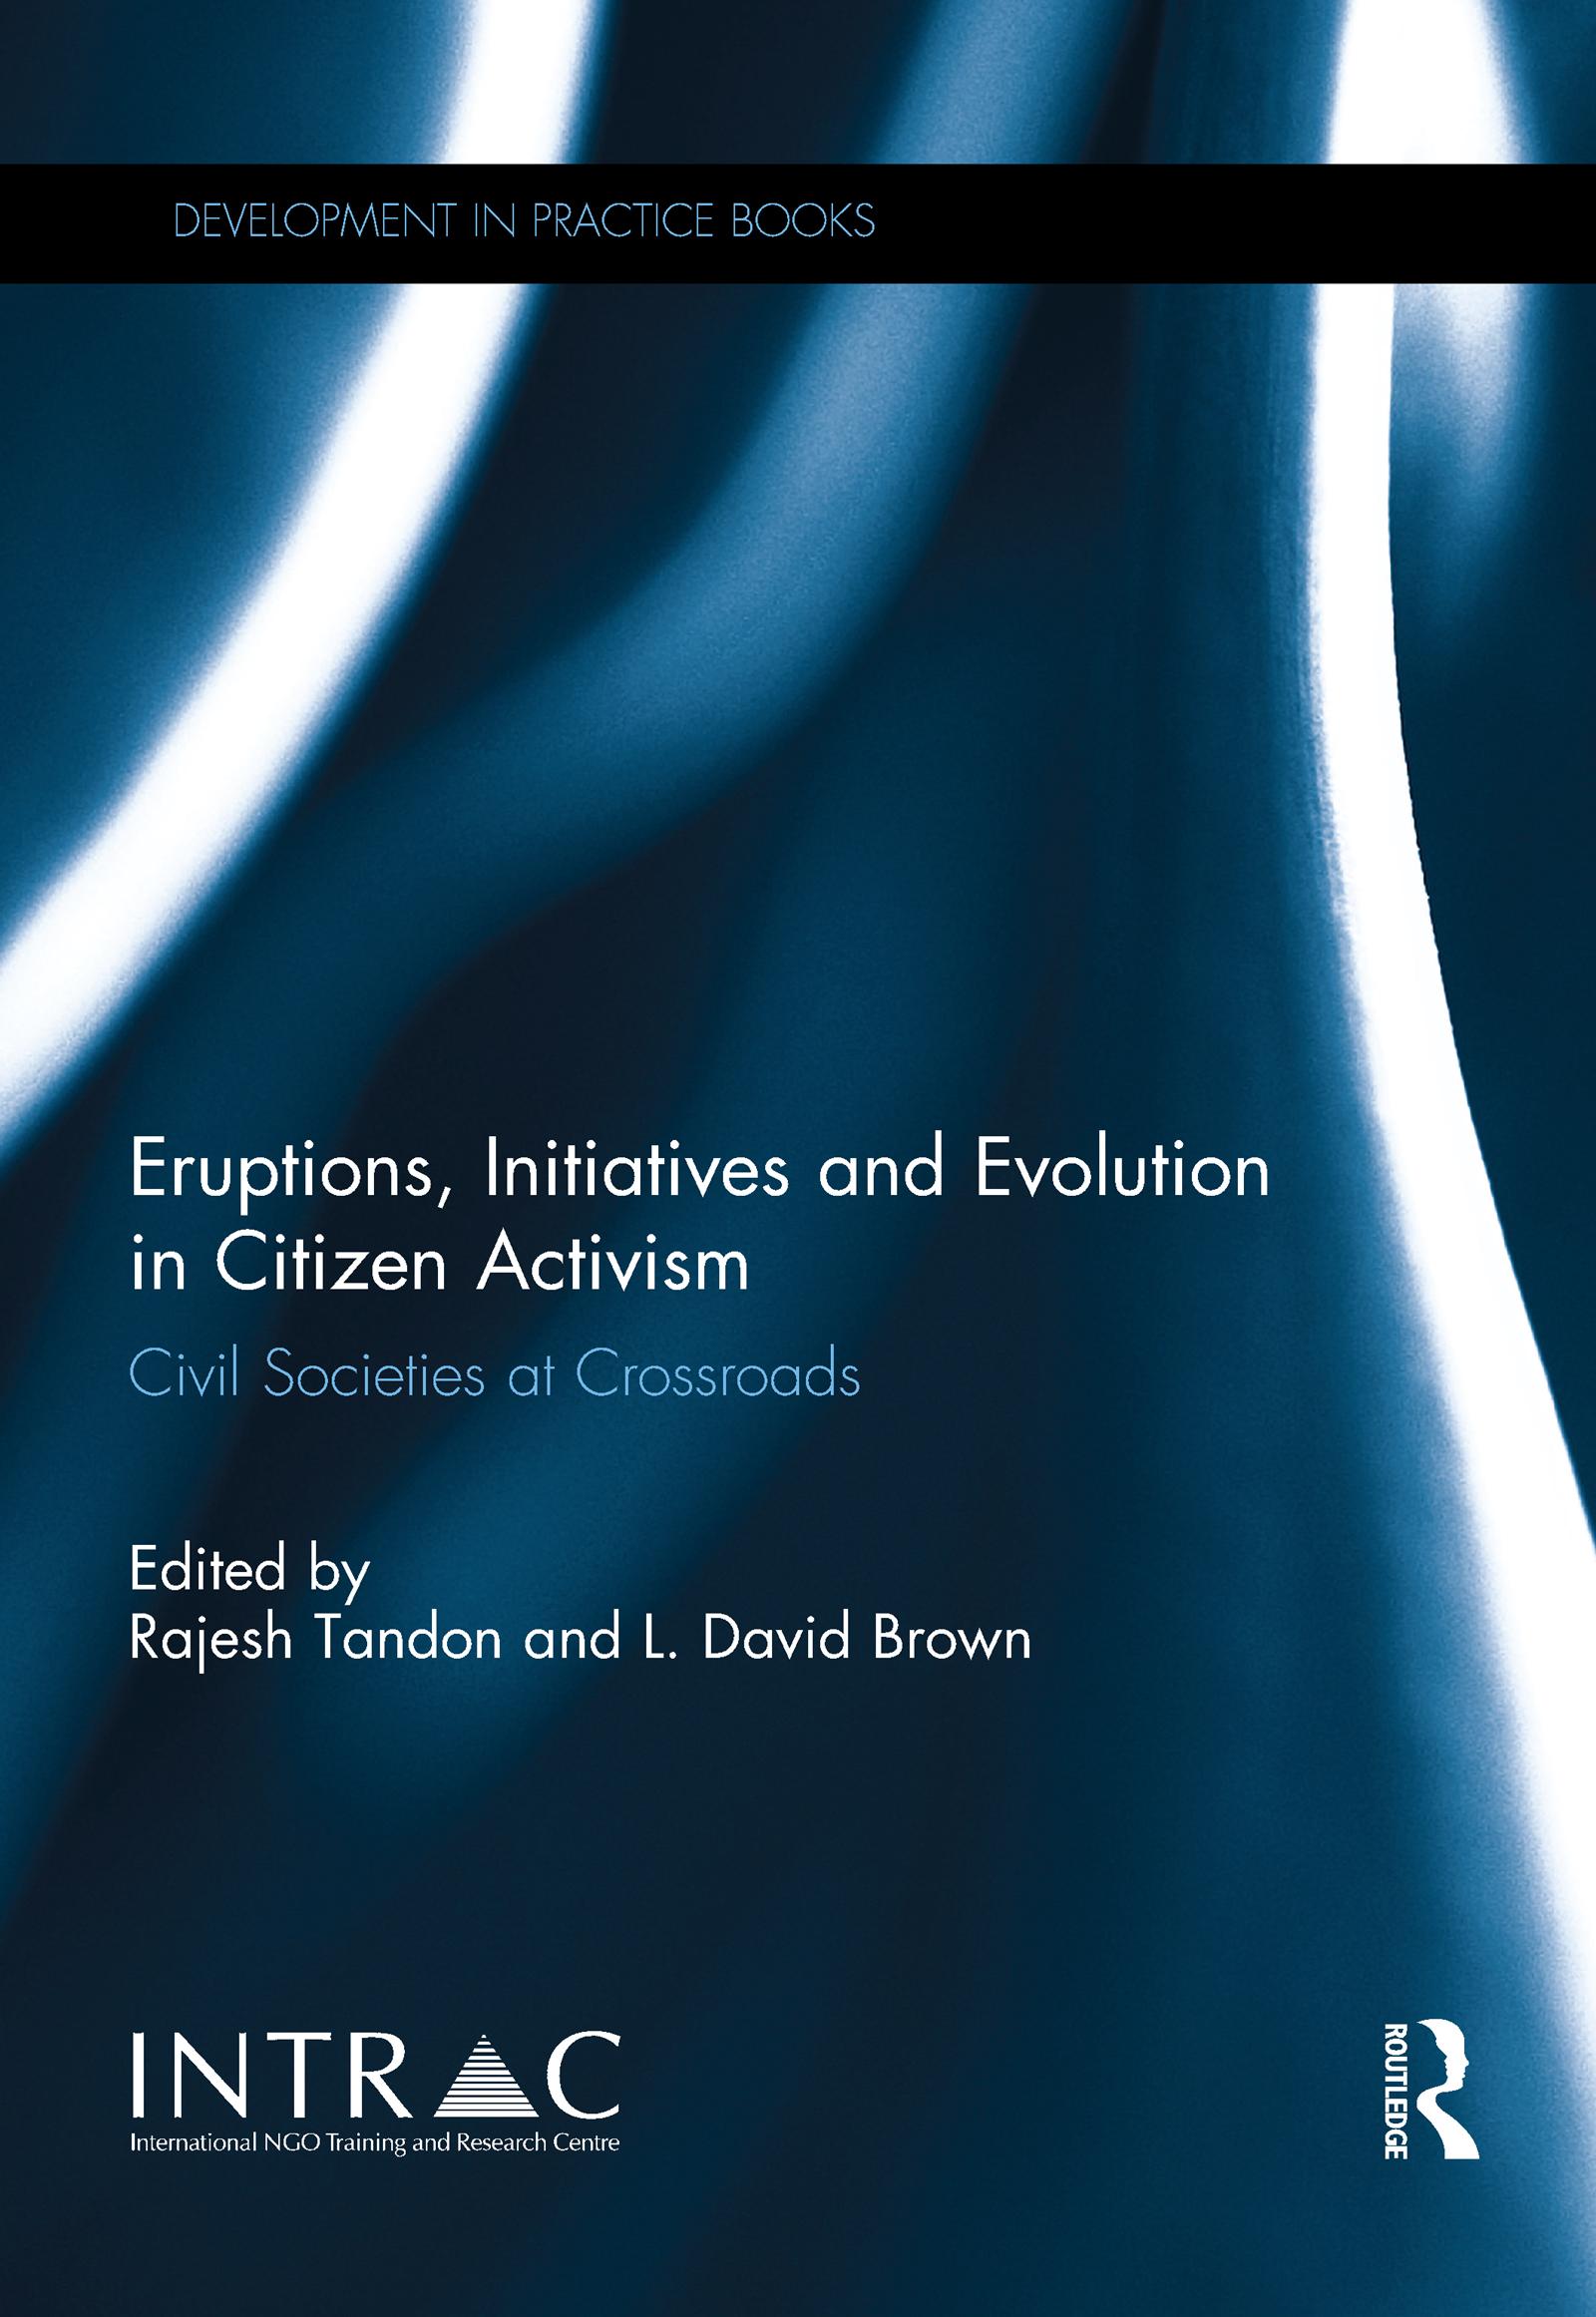 Eruptions, Initiatives and Evolution in Citizen Activism